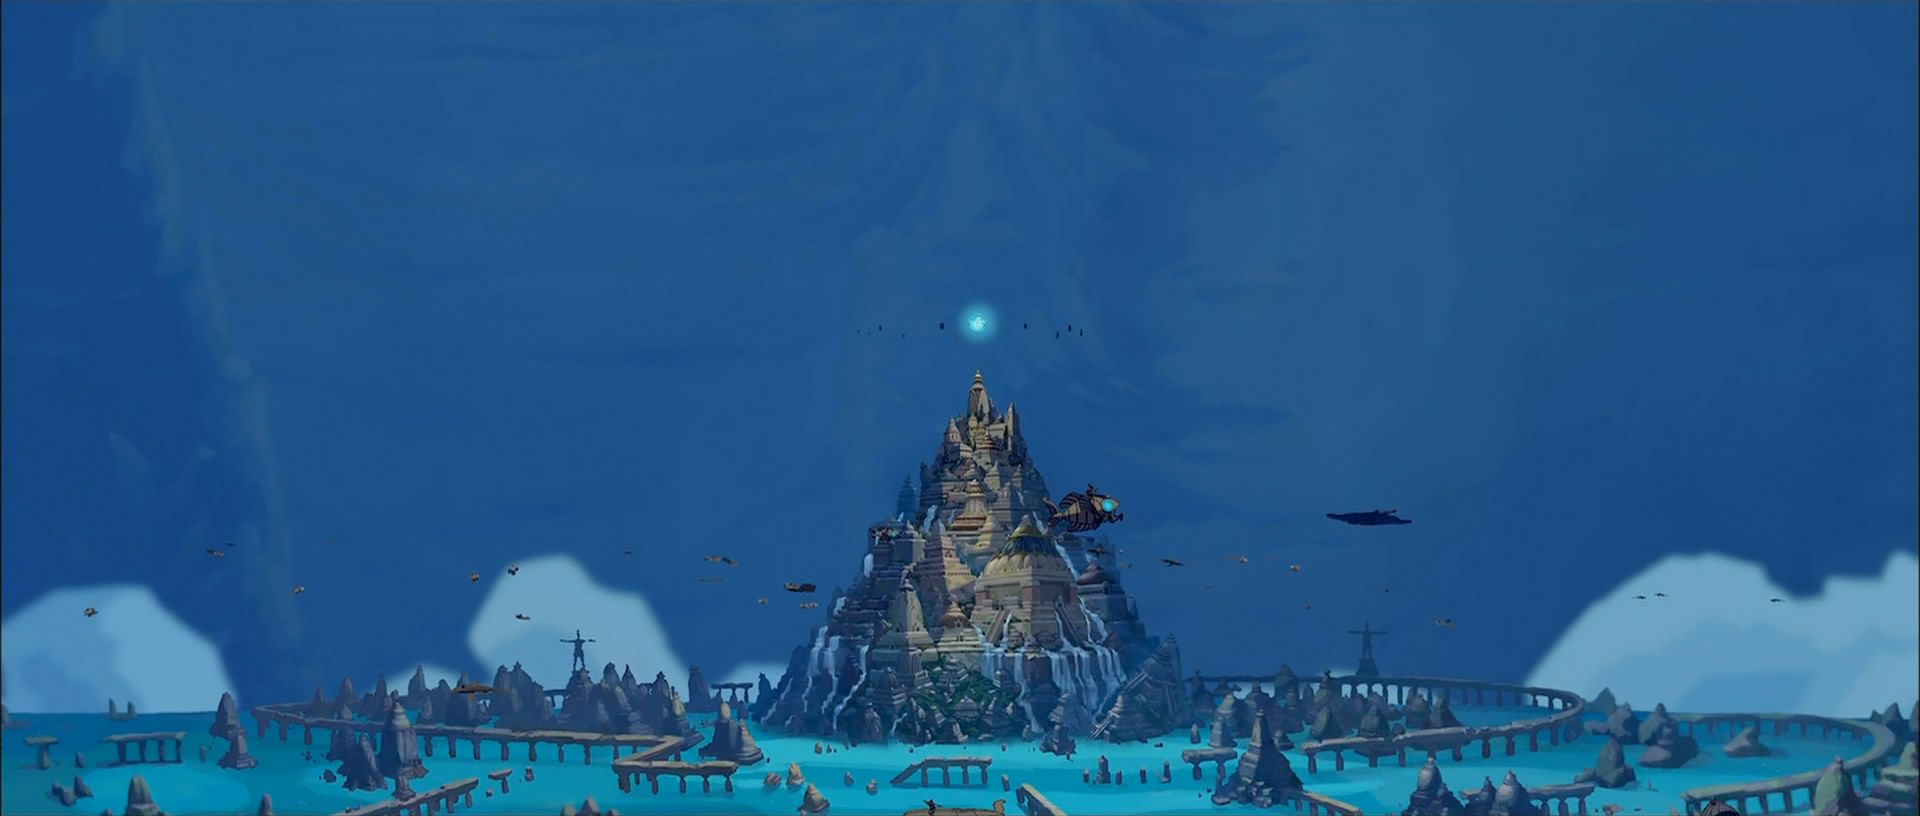 Atlantis The Lost Empire - Atlantis Photo (34237443) - Fanpop